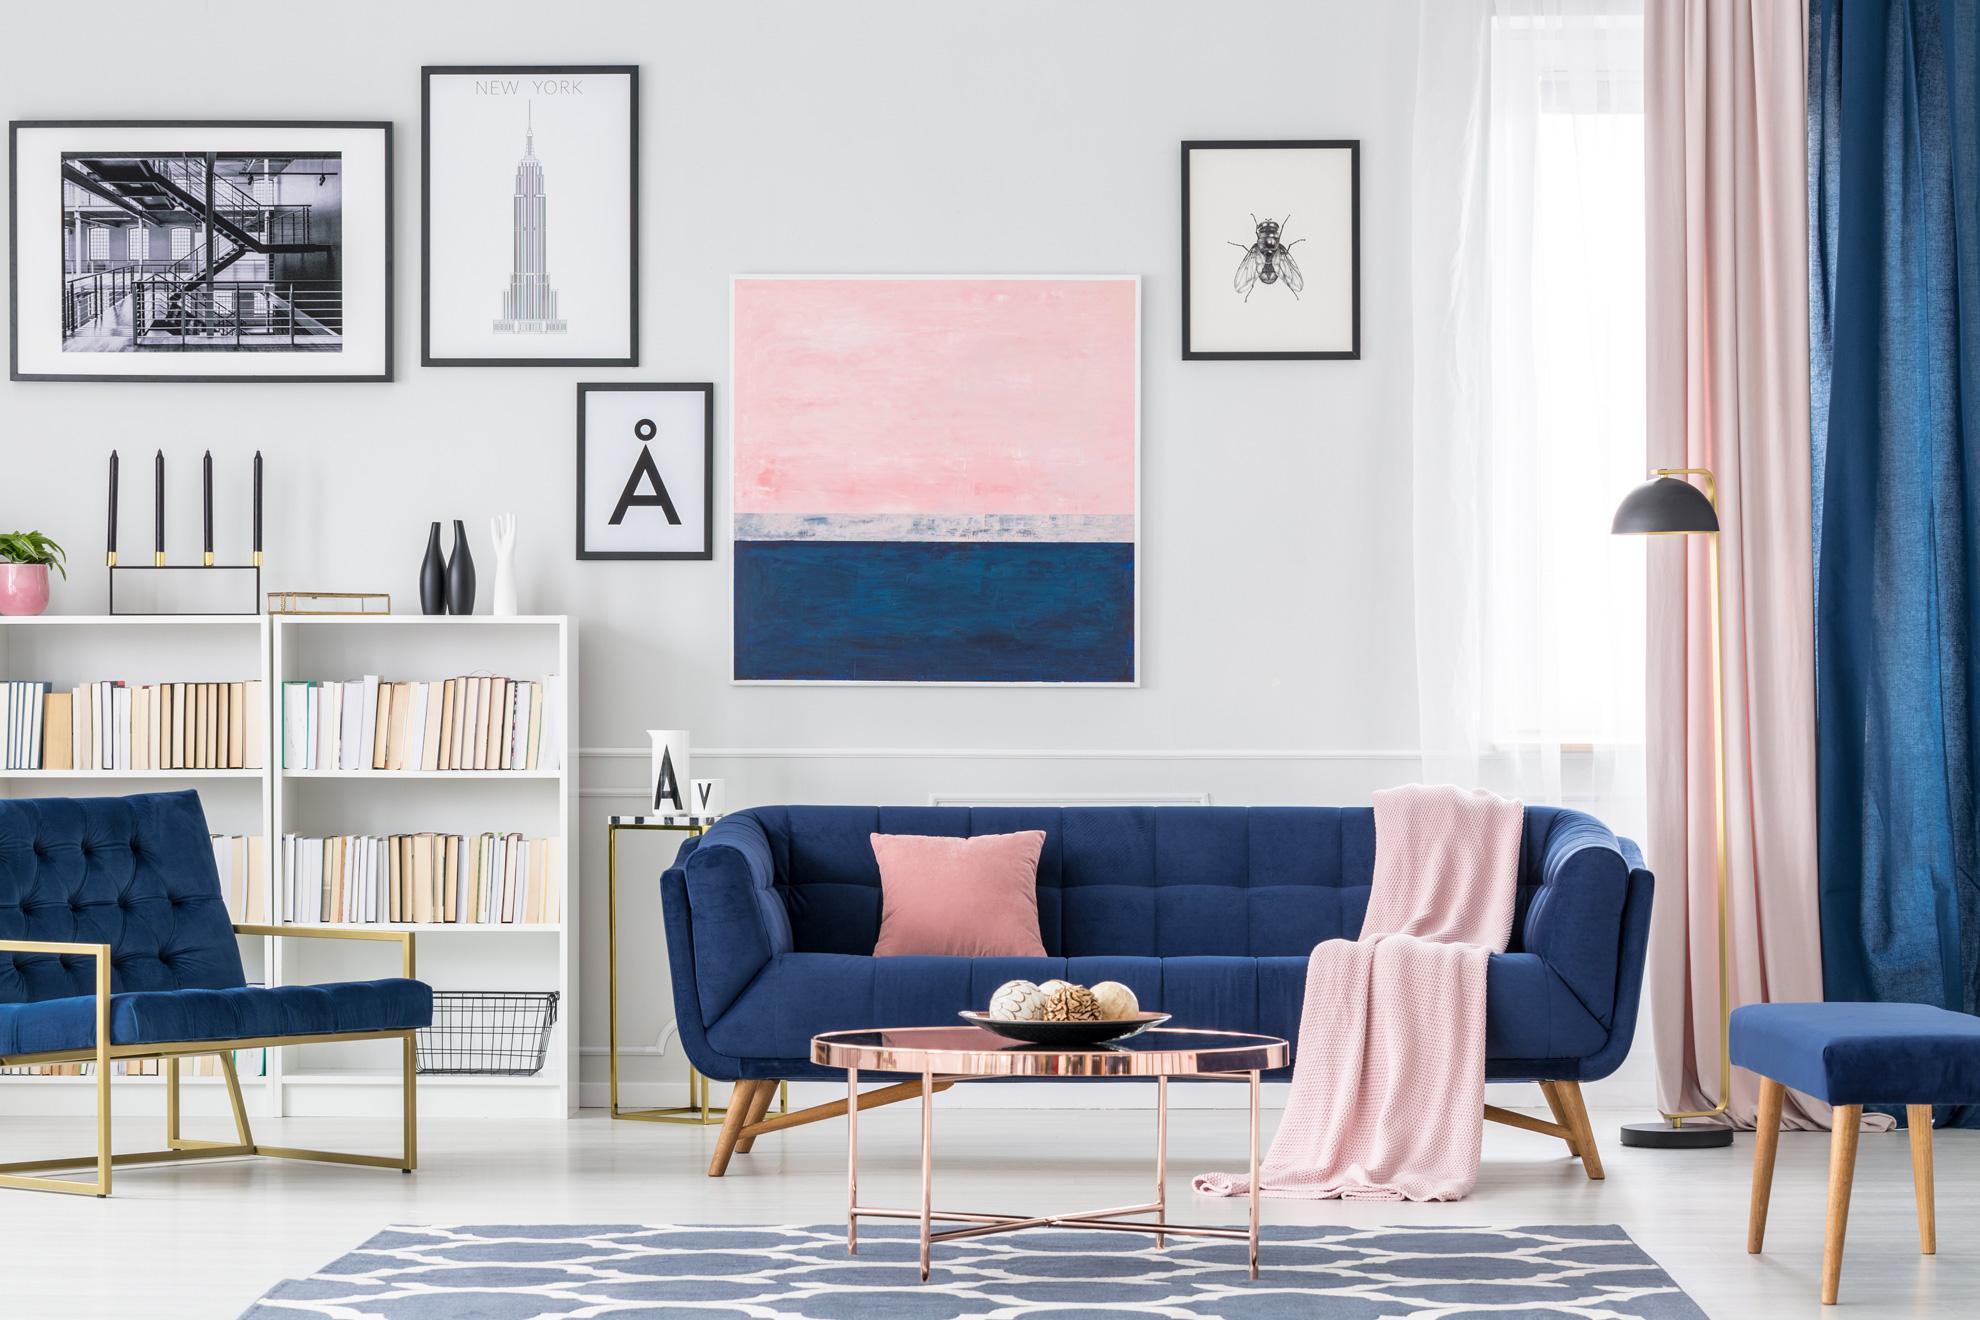 white-and-blue-living-room-PPERZQM-sm.jpg